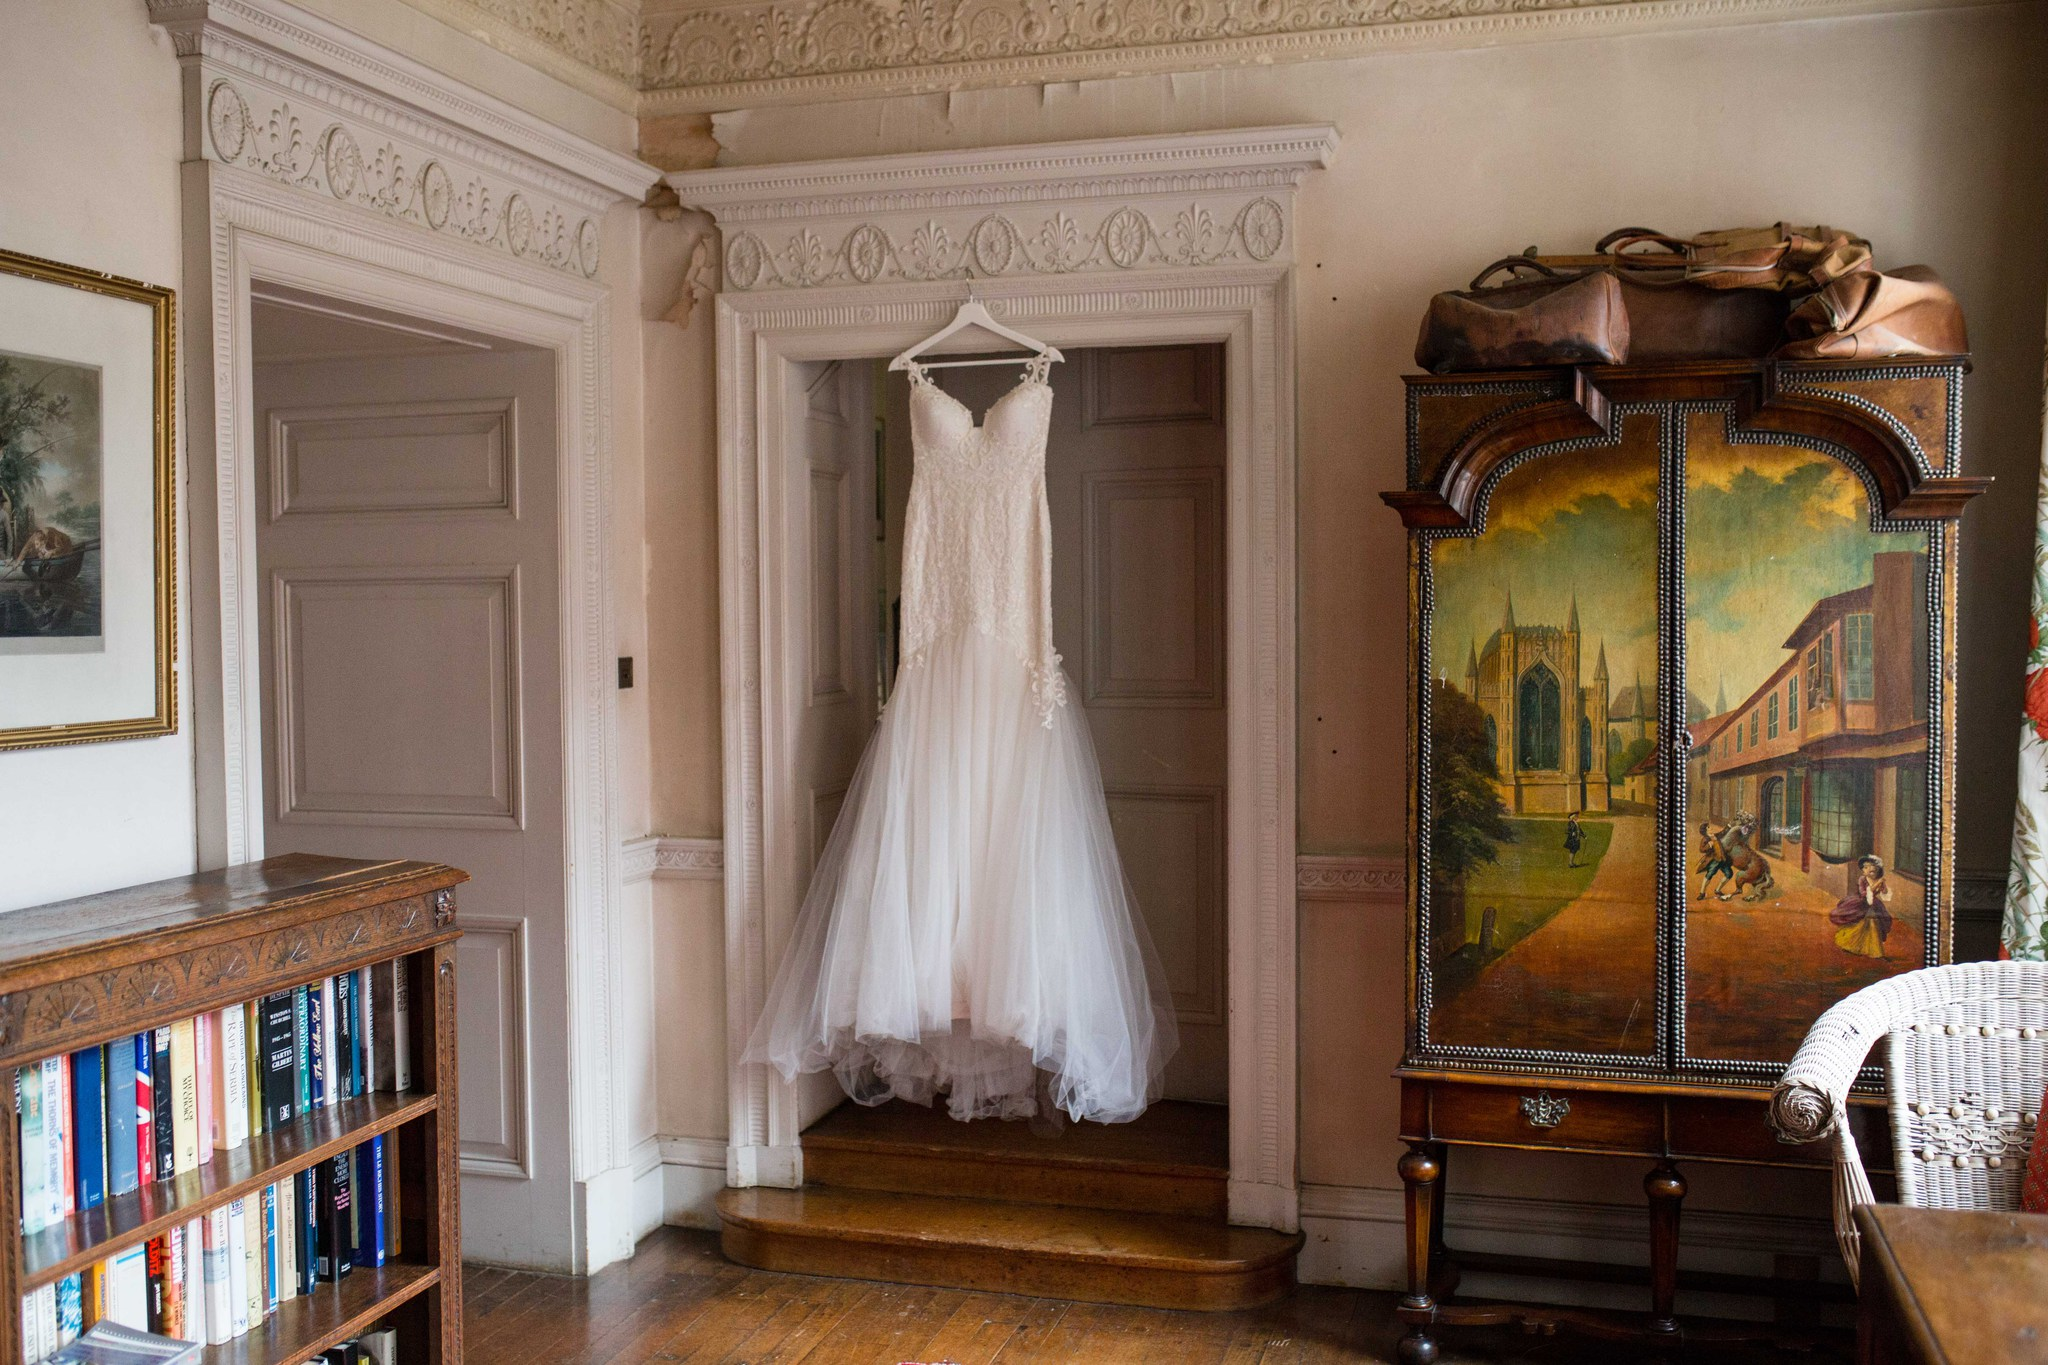 Adi Shlomo Dress Hanging Up Interior Walcot Hall Shropshire